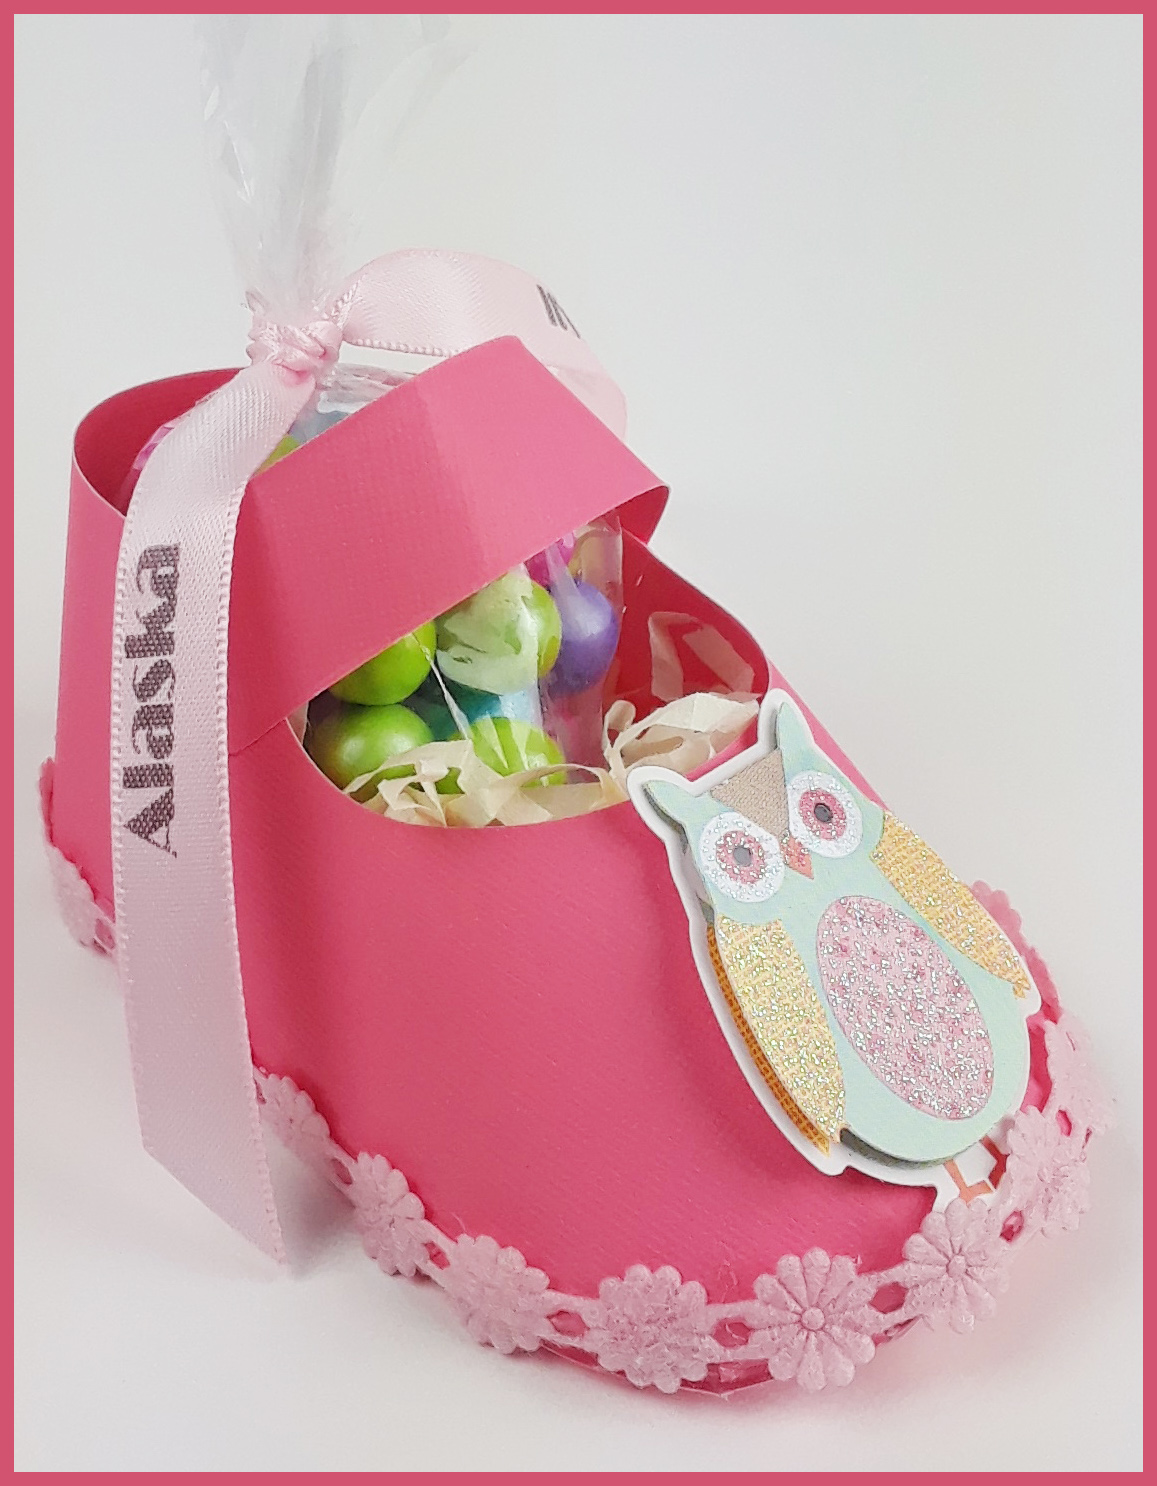 Assembled girl baby shower favors - Au Bouquet